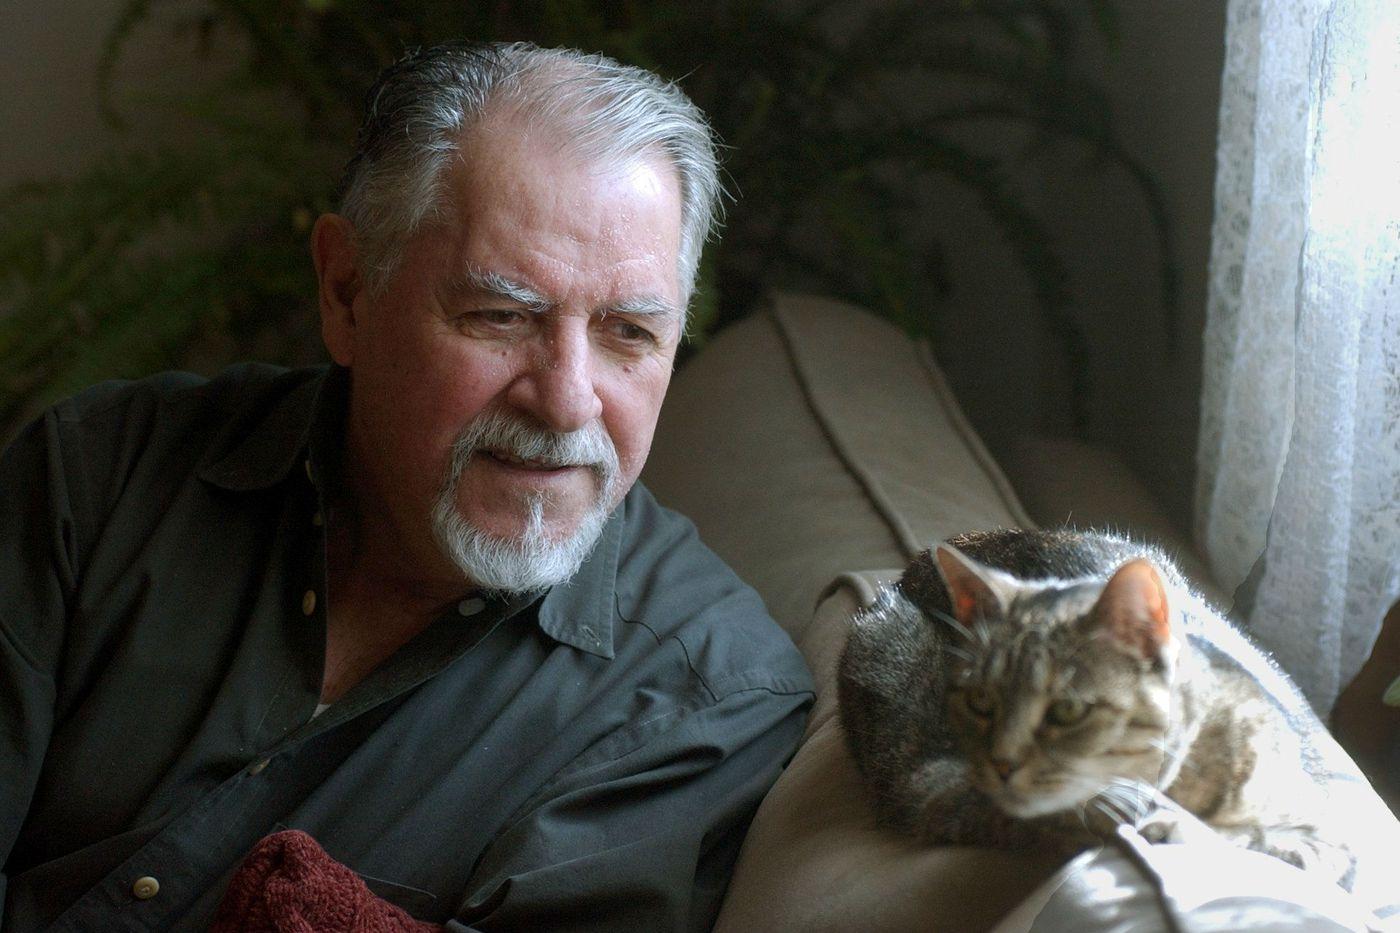 Lou Lippa, actor, teacher, role model, dies at 90